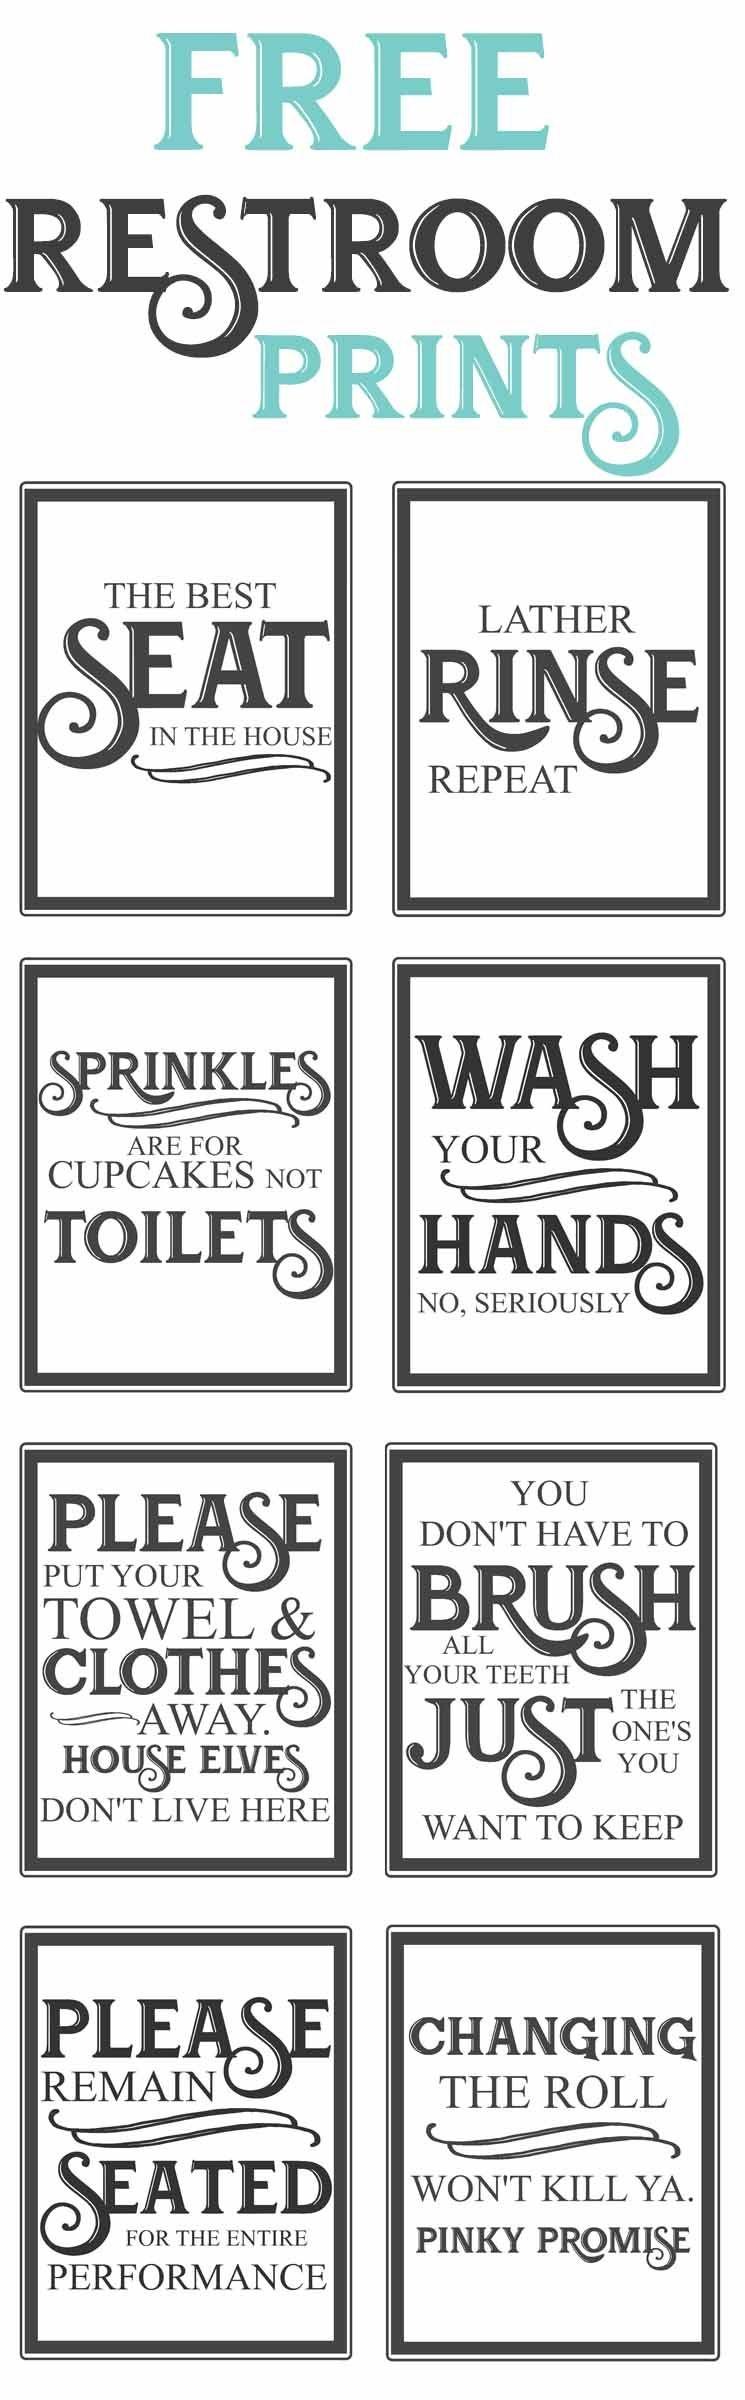 Free Vintage Bathroom Printables | Diy | Vintage Bathrooms, Diy Home - Free Printable Do Not Flush Signs